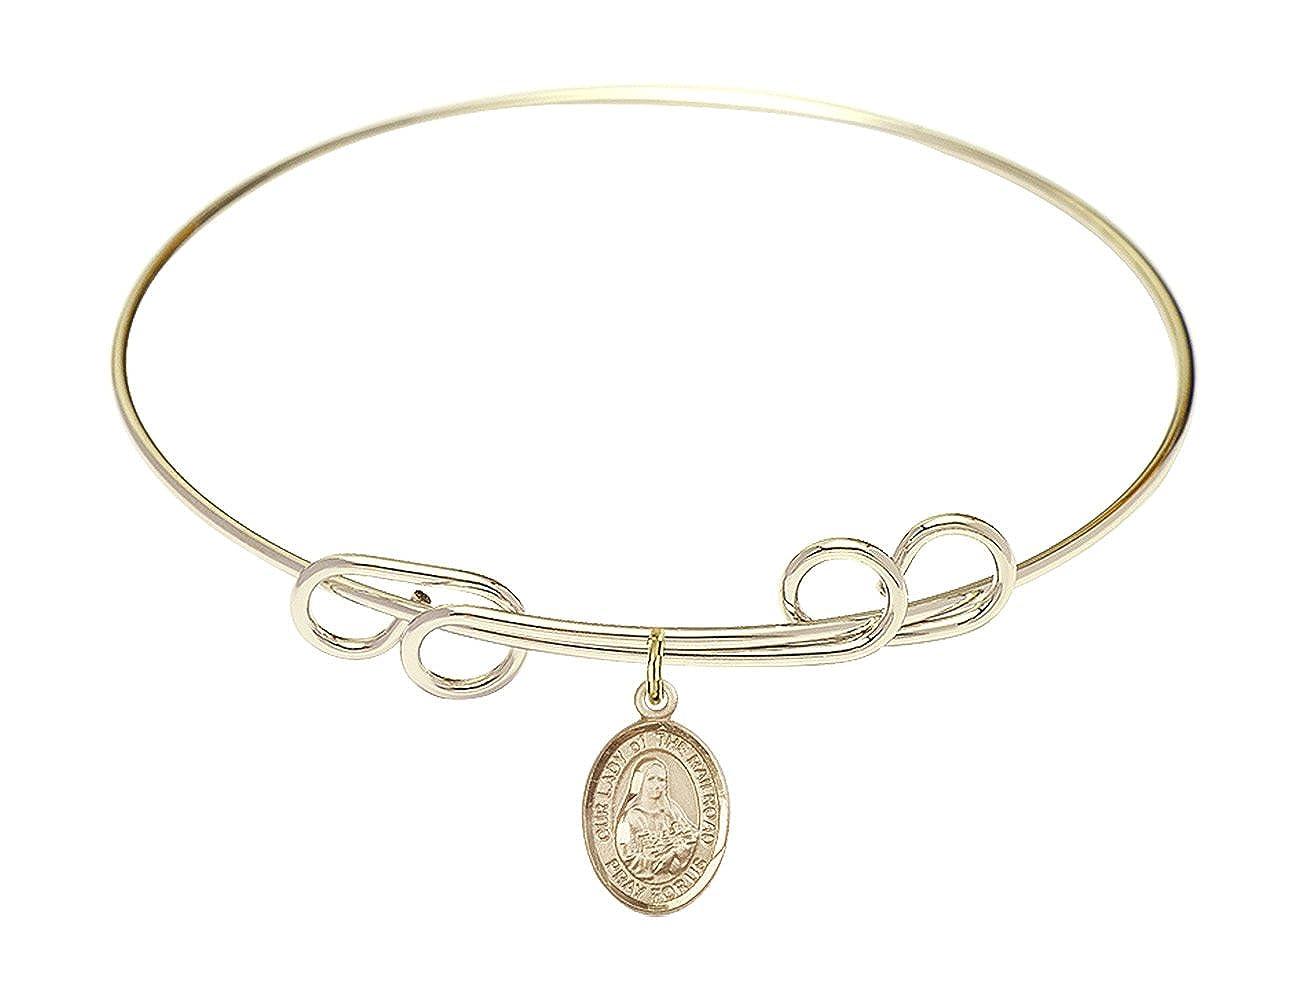 DiamondJewelryNY Double Loop Bangle Bracelet with a O//L of The Railroad Charm.